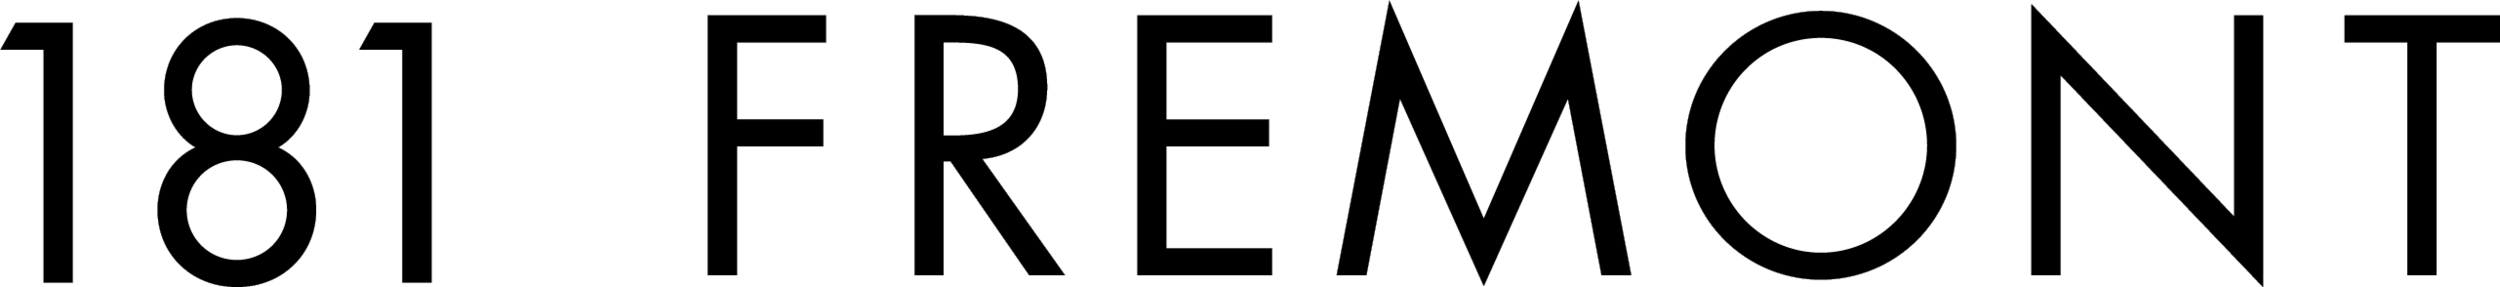 181_logo_black.png